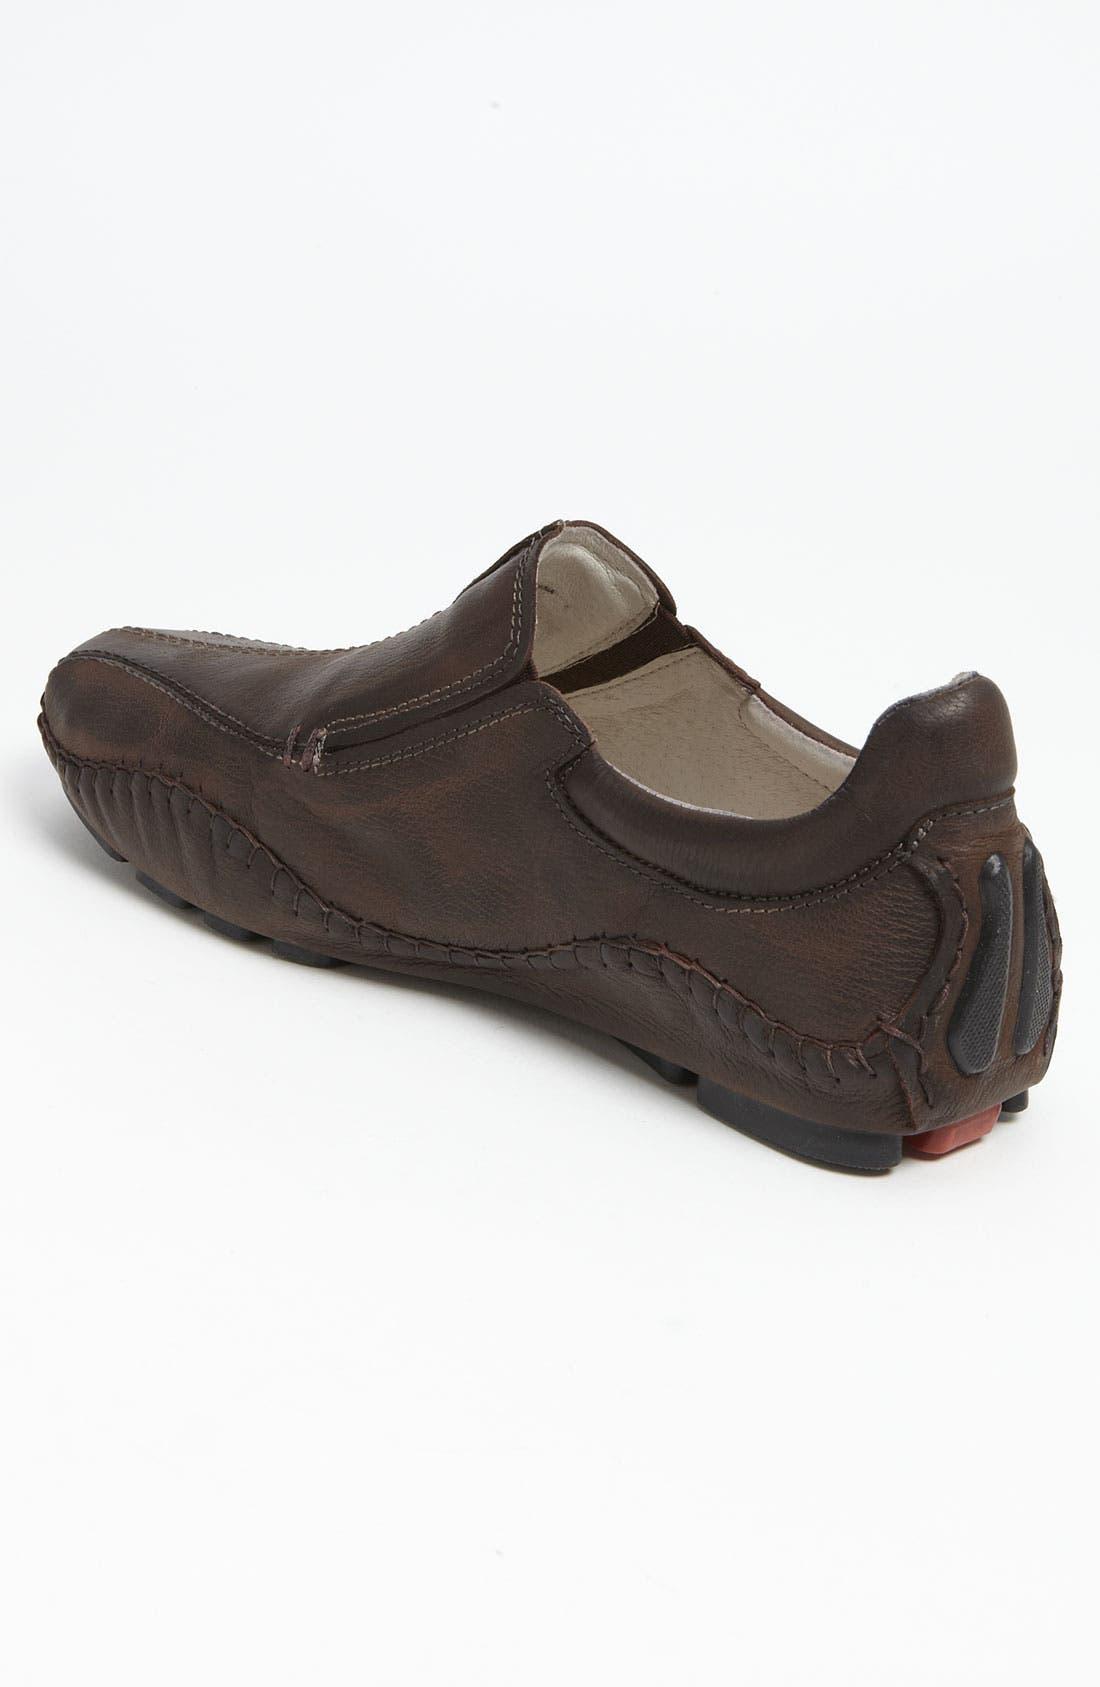 Alternate Image 2  - PIKOLINOS 'Fuencarral' Driving Shoe